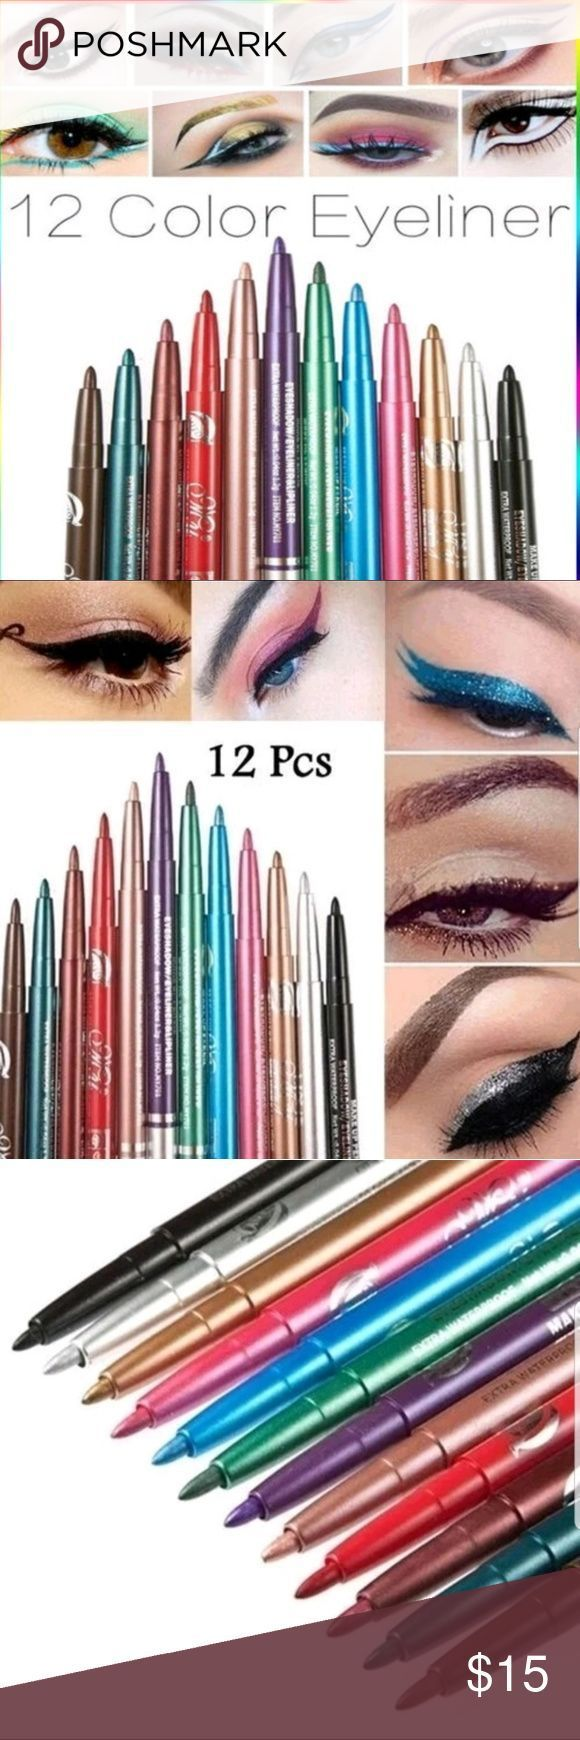 12 pcs high quality waterproof colorful eyeliner Type: Eyeliner Benefit: Long-la... 12 pcs high qua